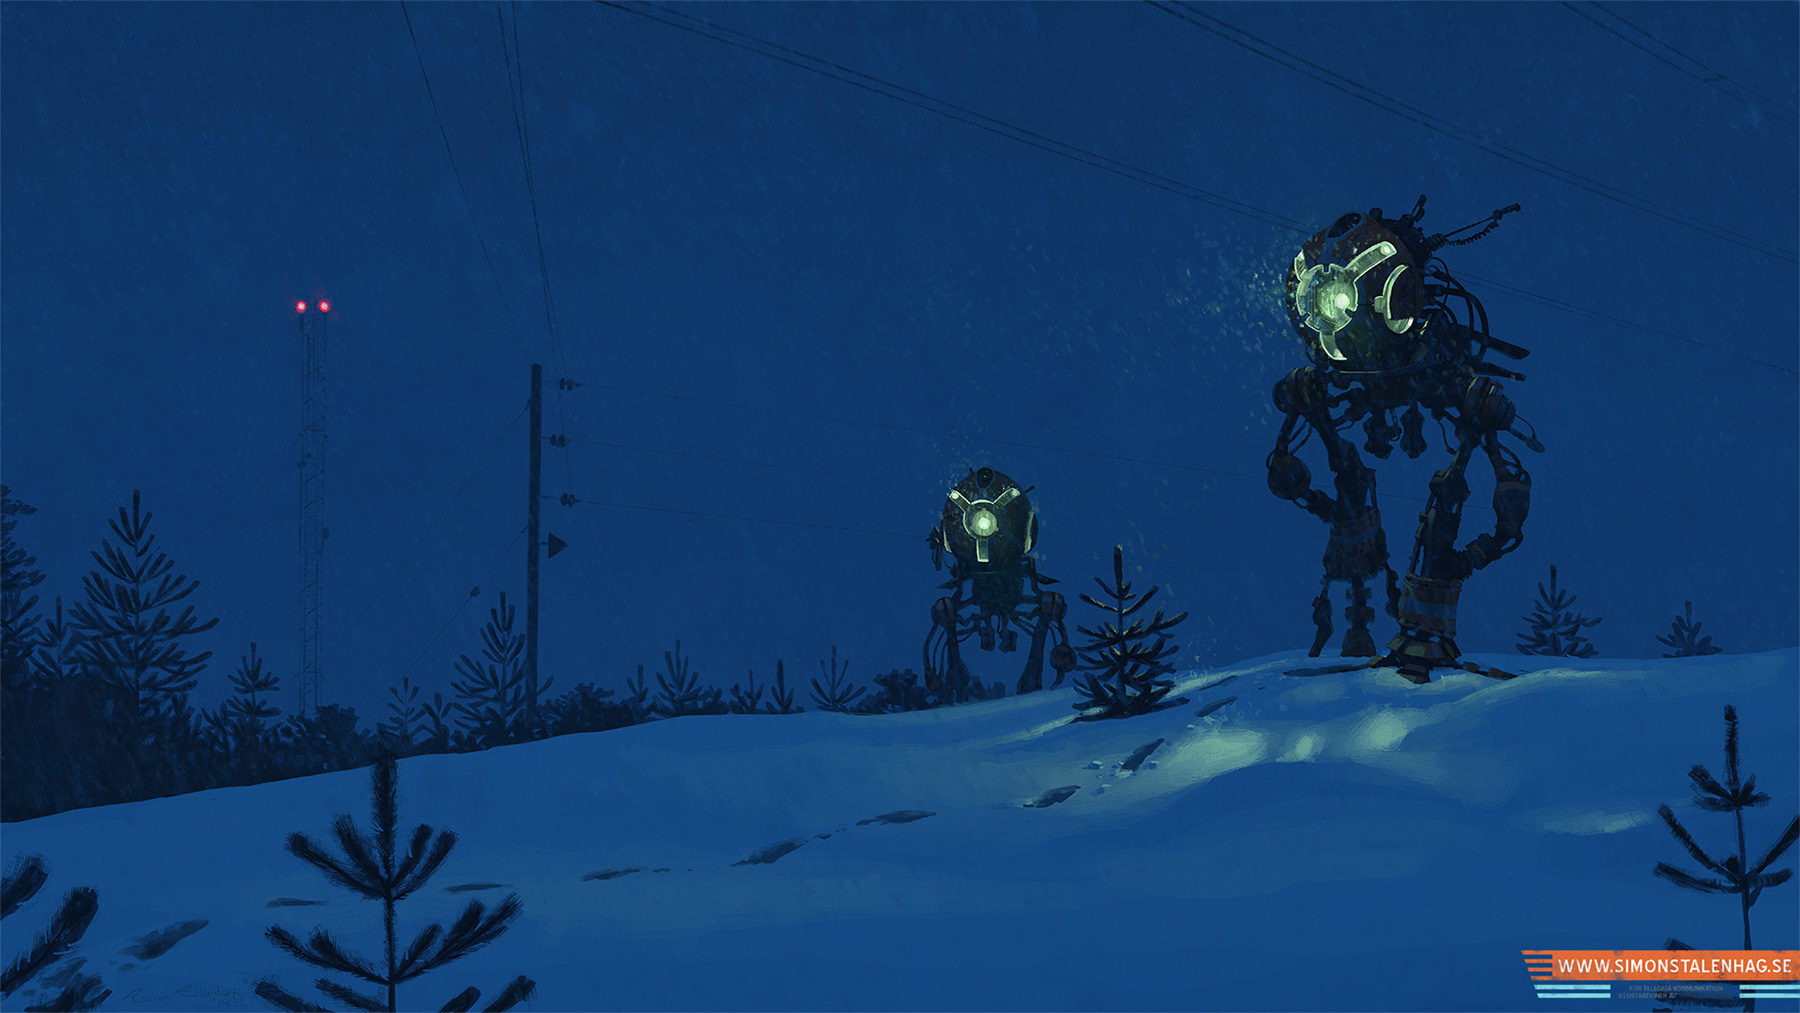 Black Hole Animated Wallpaper Concept Robots December 2014